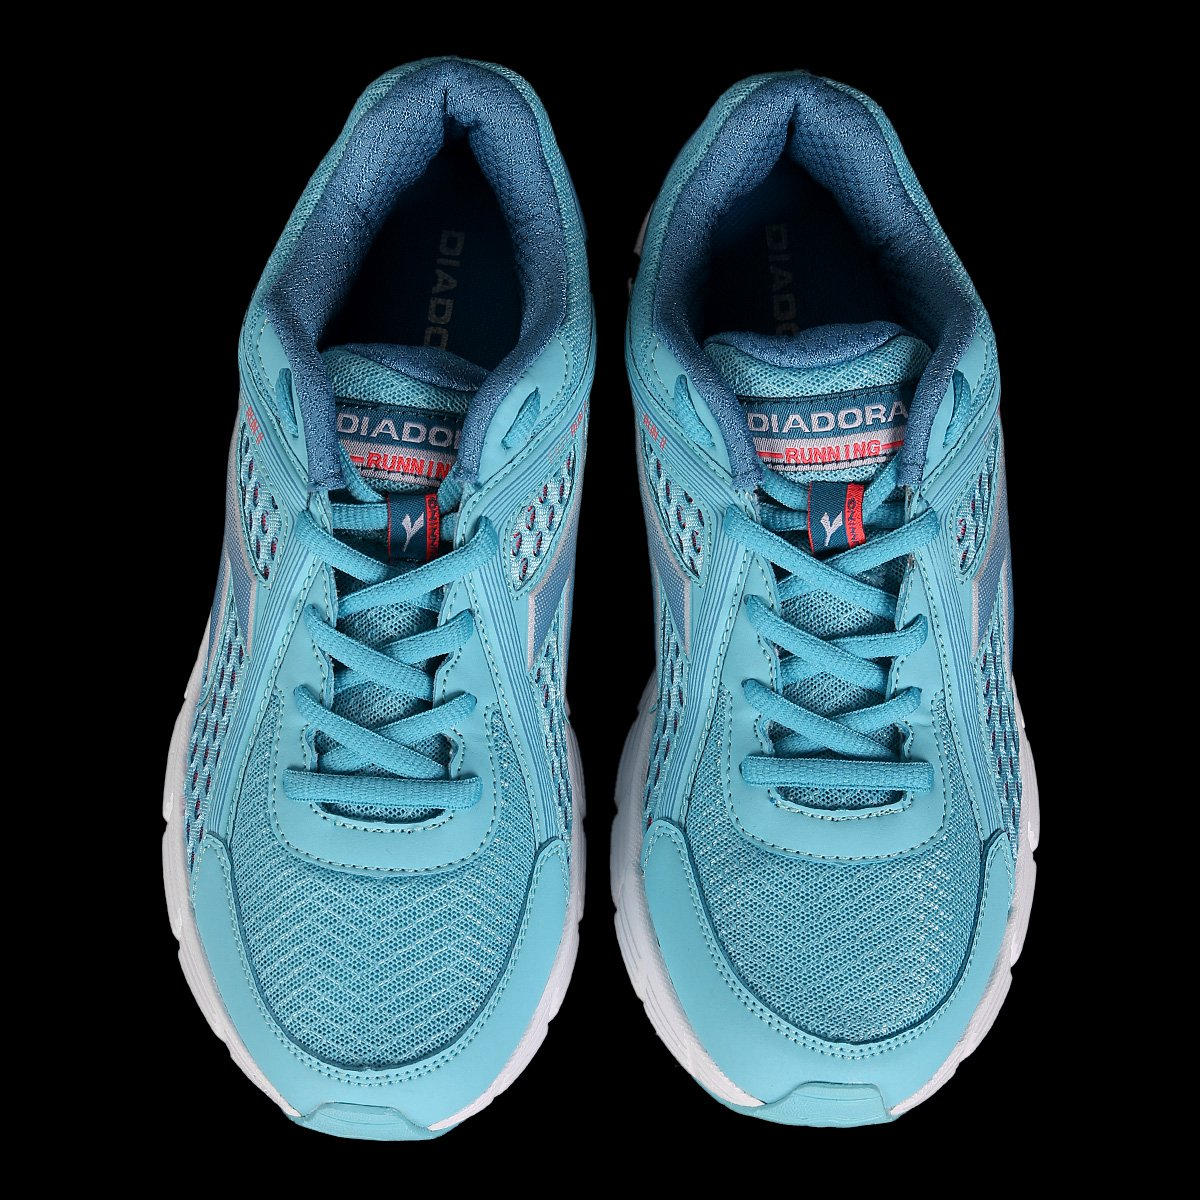 c129099b6c Tênis Diadora Easy Run 2 Feminino - Azul - Compre Agora